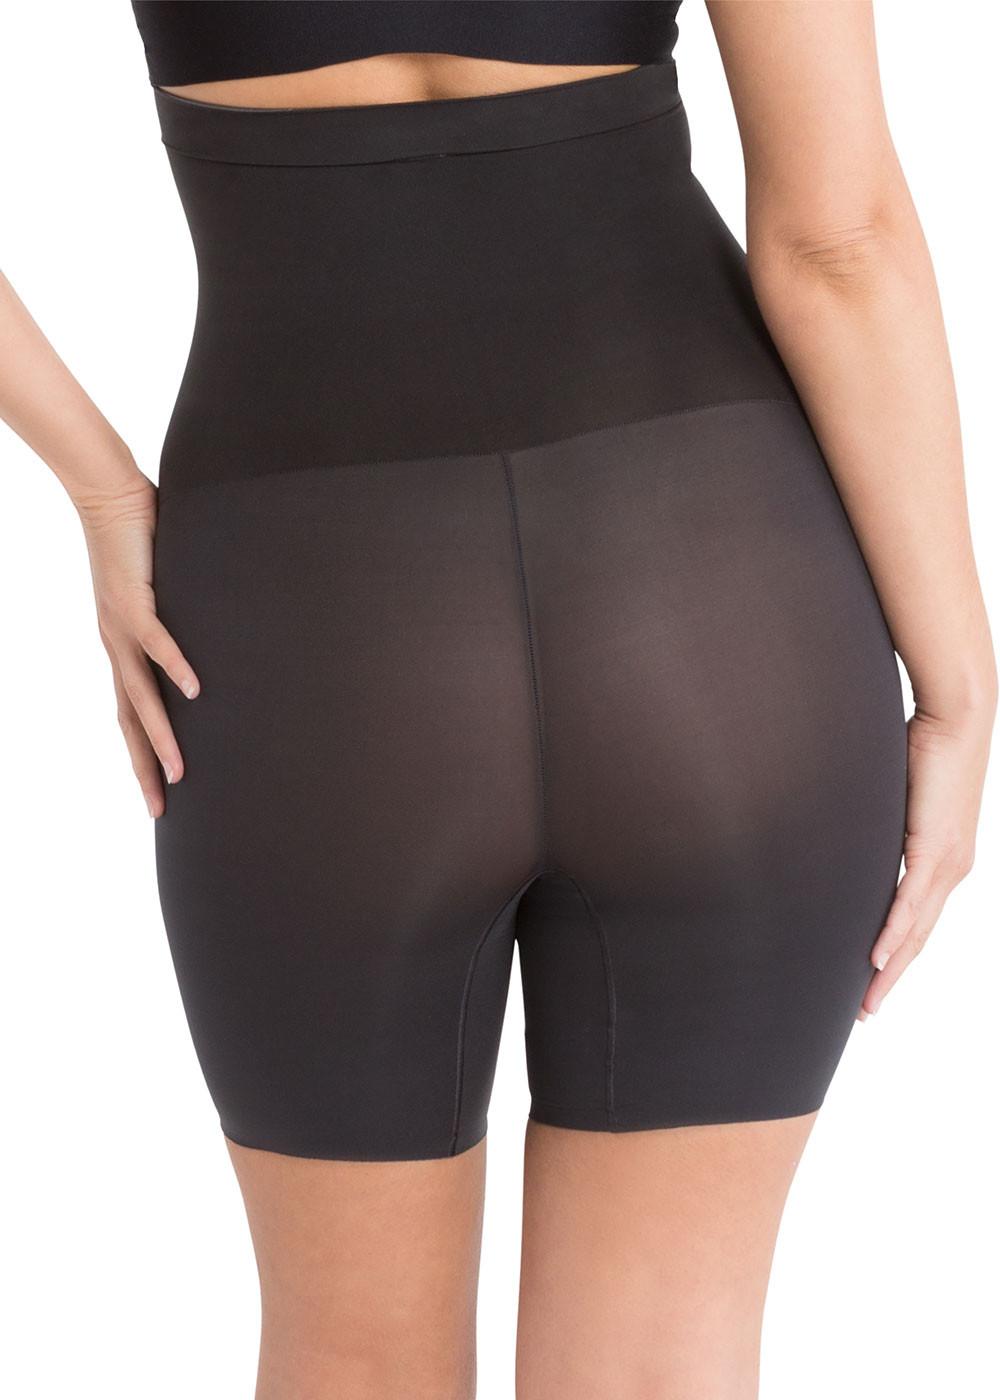 Spanx Shape My Day Shaping Shorts XS-XL